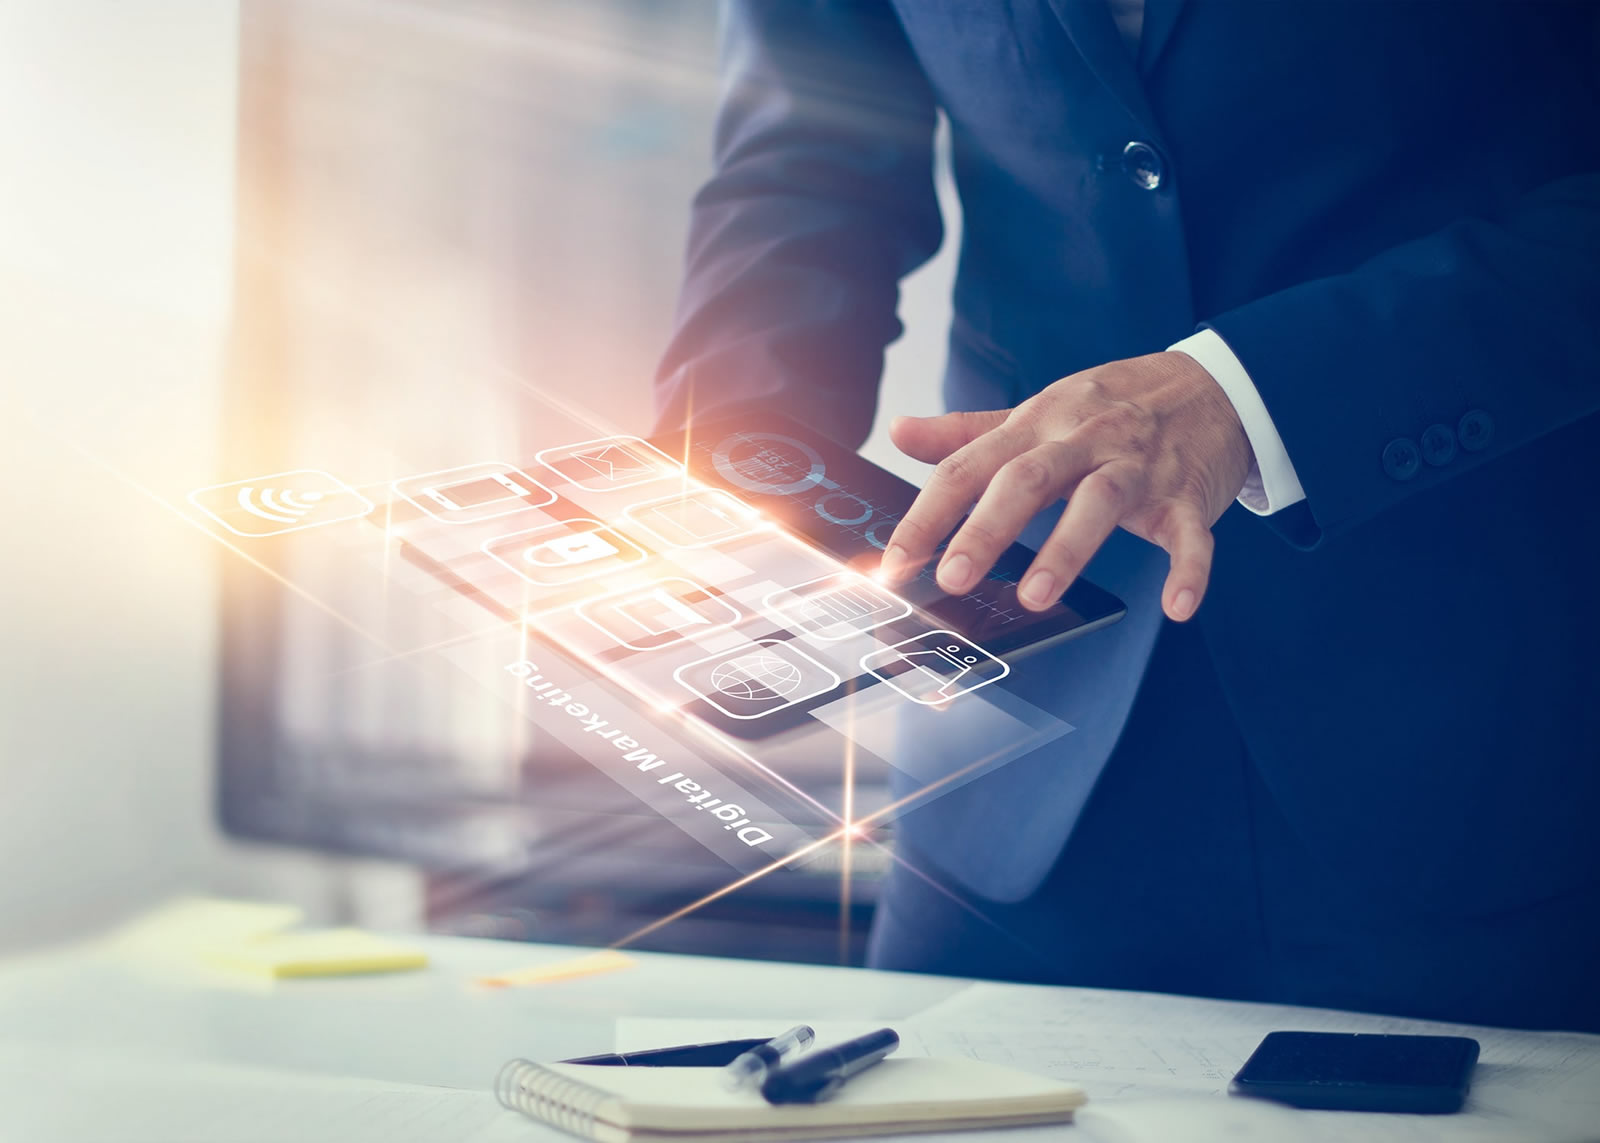 naem-2018-12-07-latest-news-digital-marketing-businessman-using-modern-interface-700x500